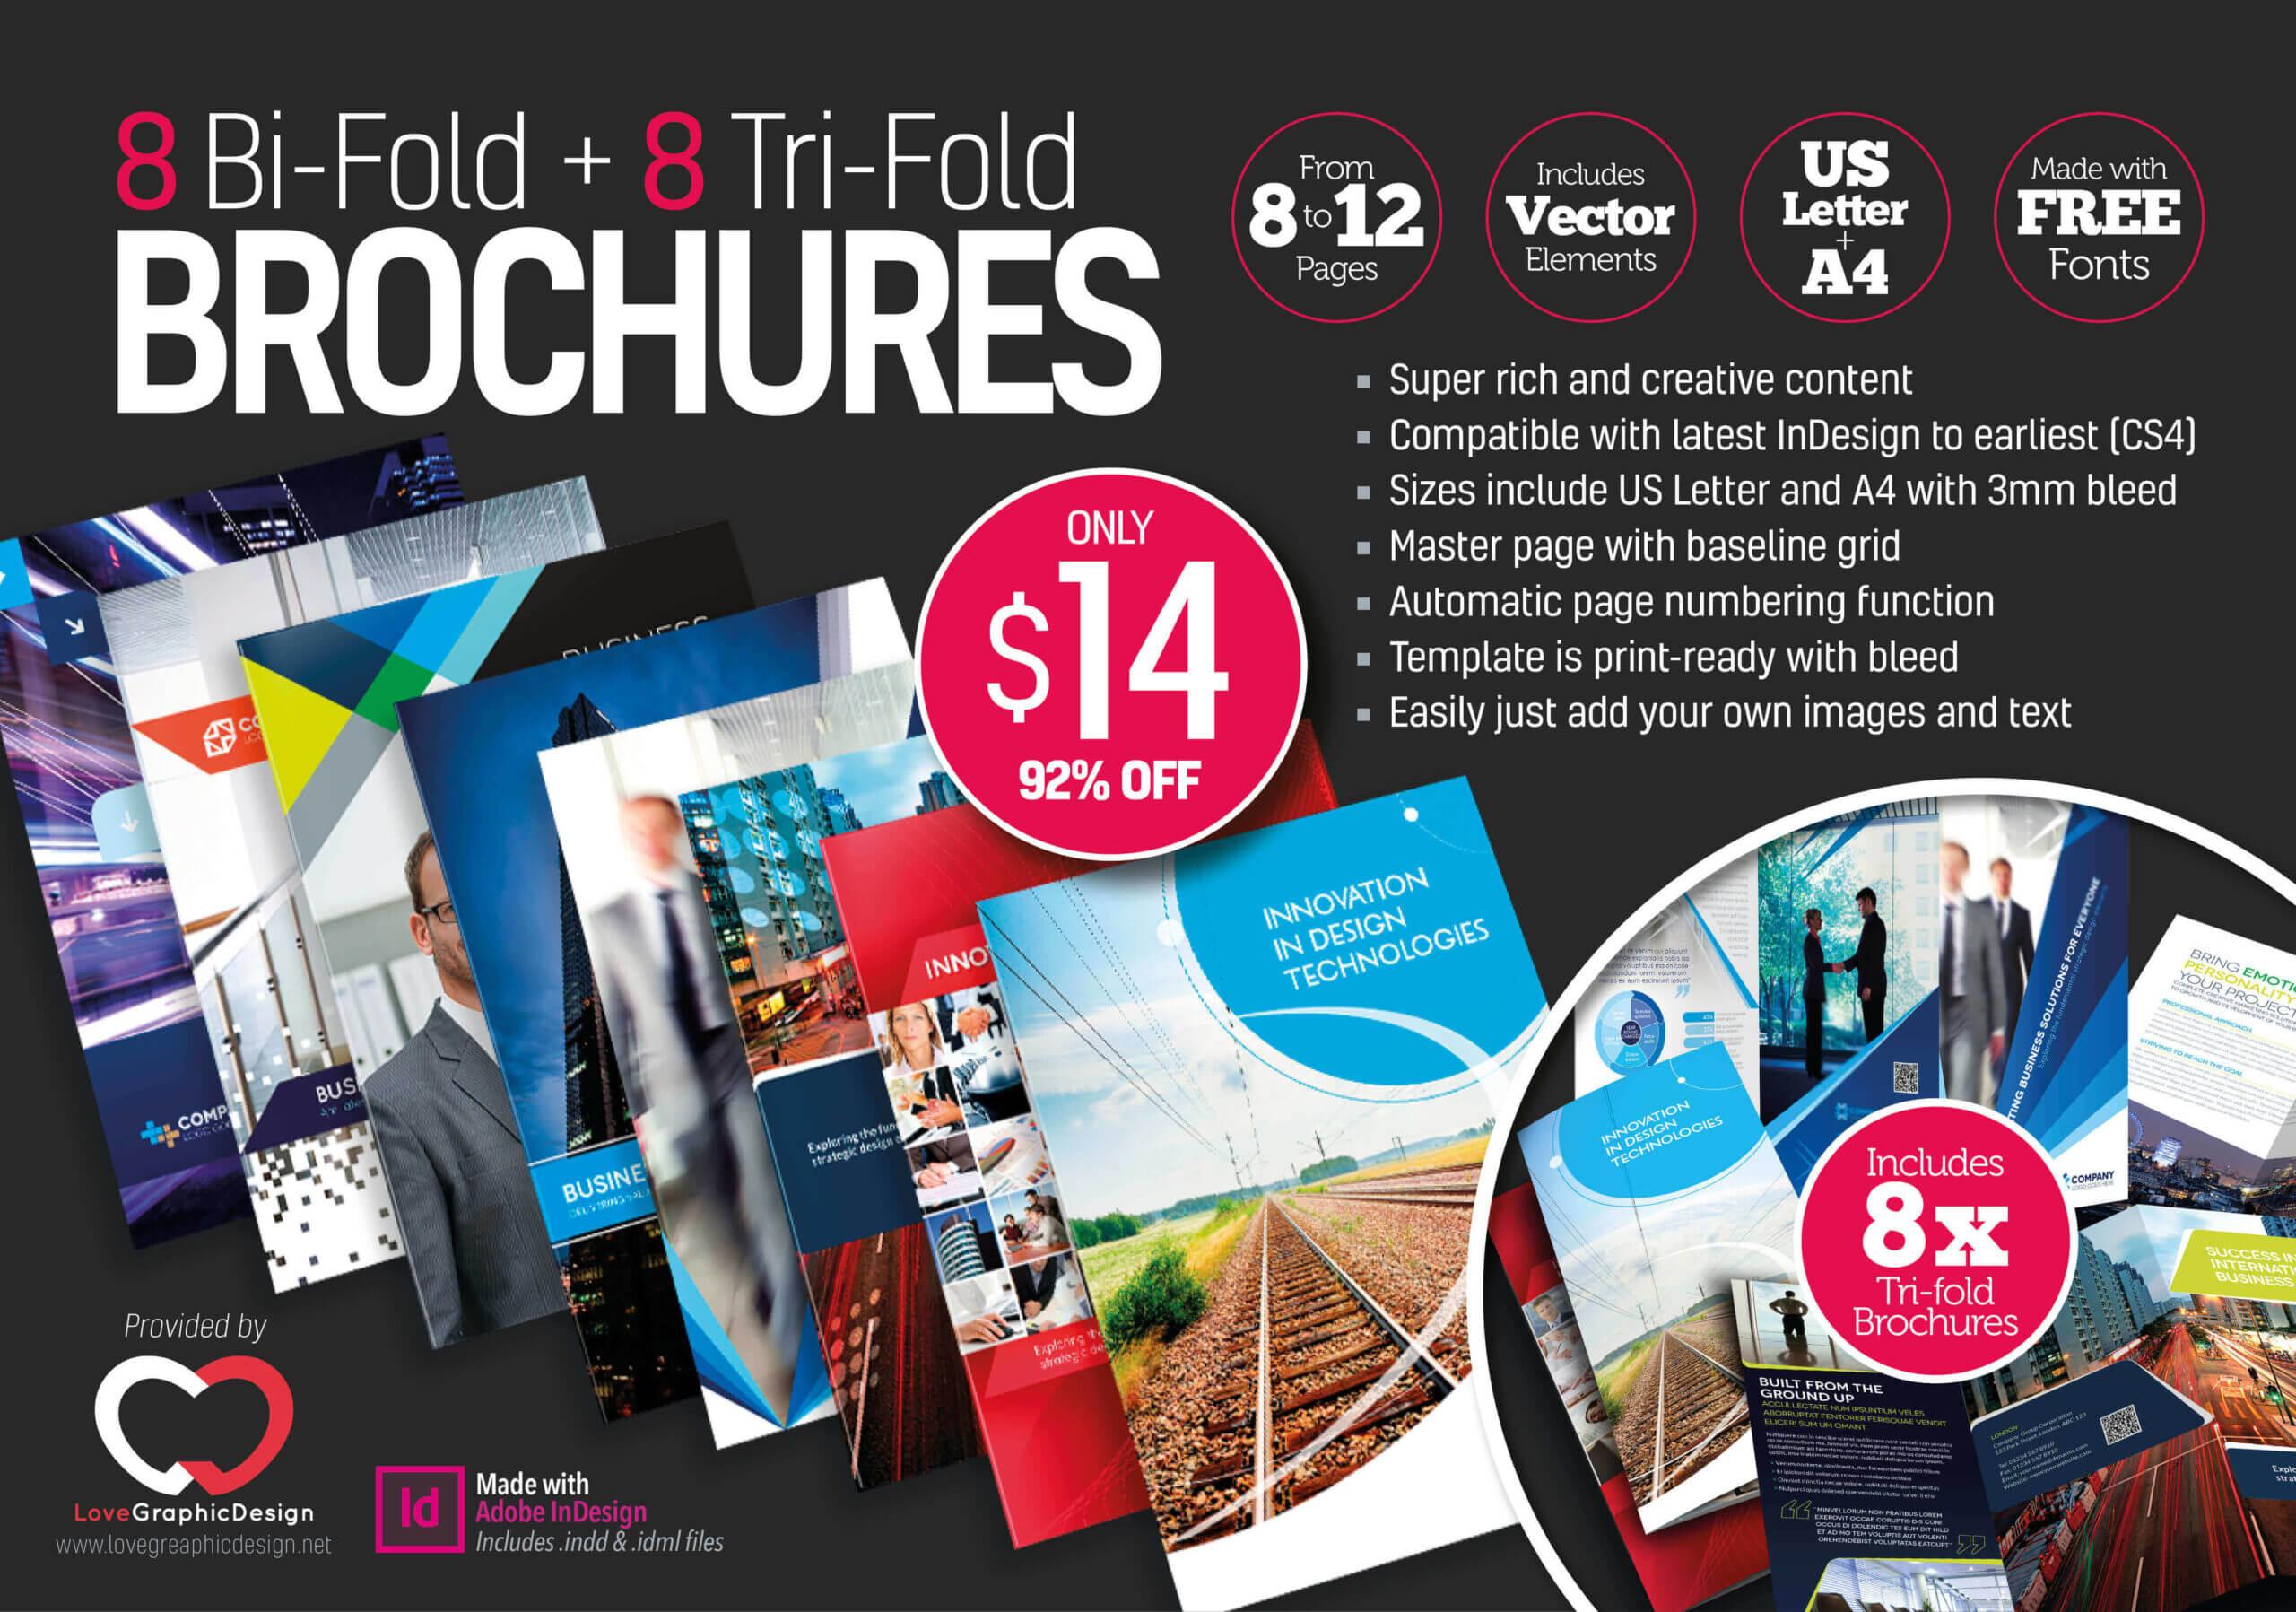 8 Print Ready Indesign Bi Fold & Tri Fold Brochure Templates For Adobe Indesign Tri Fold Brochure Template